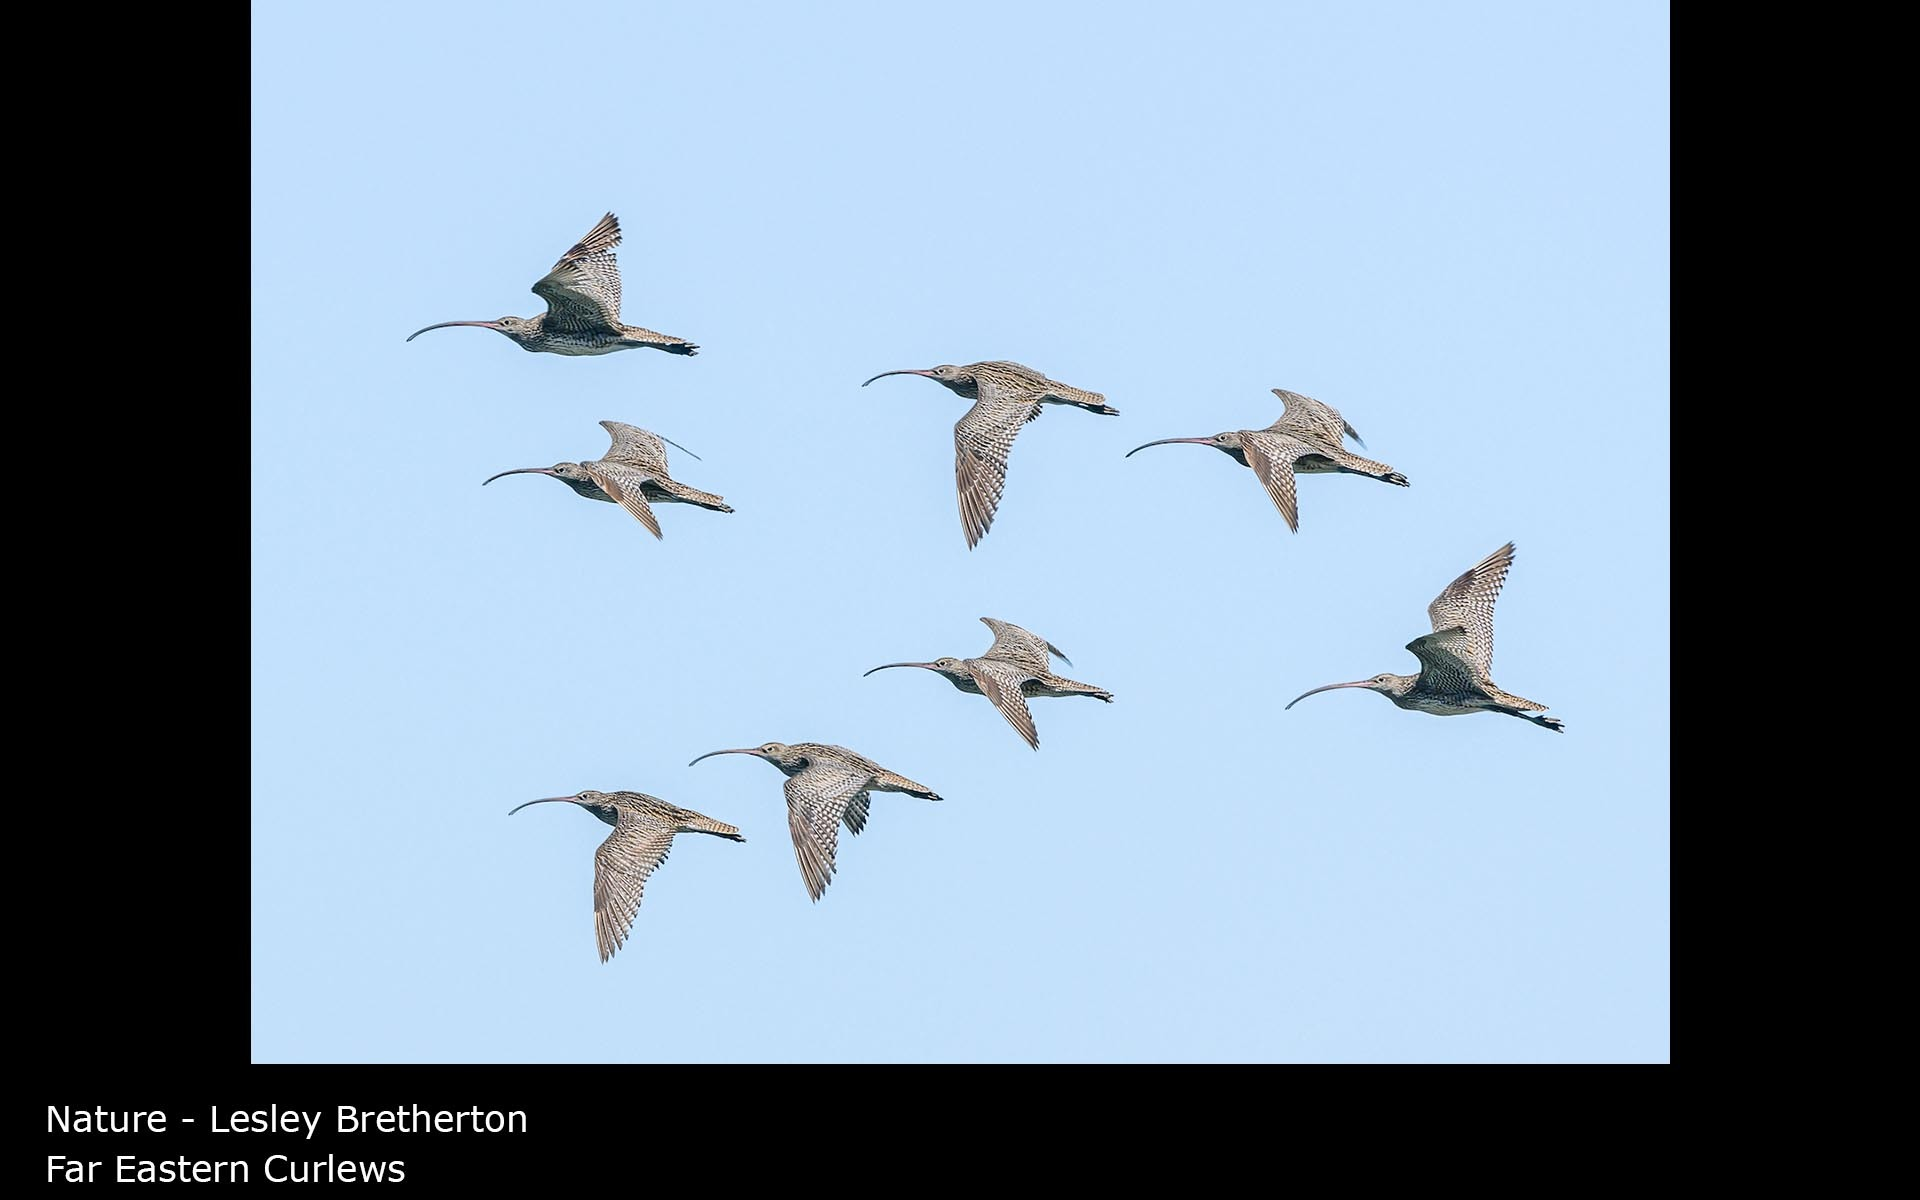 Far Eastern Curlews - Lesley Bretherton